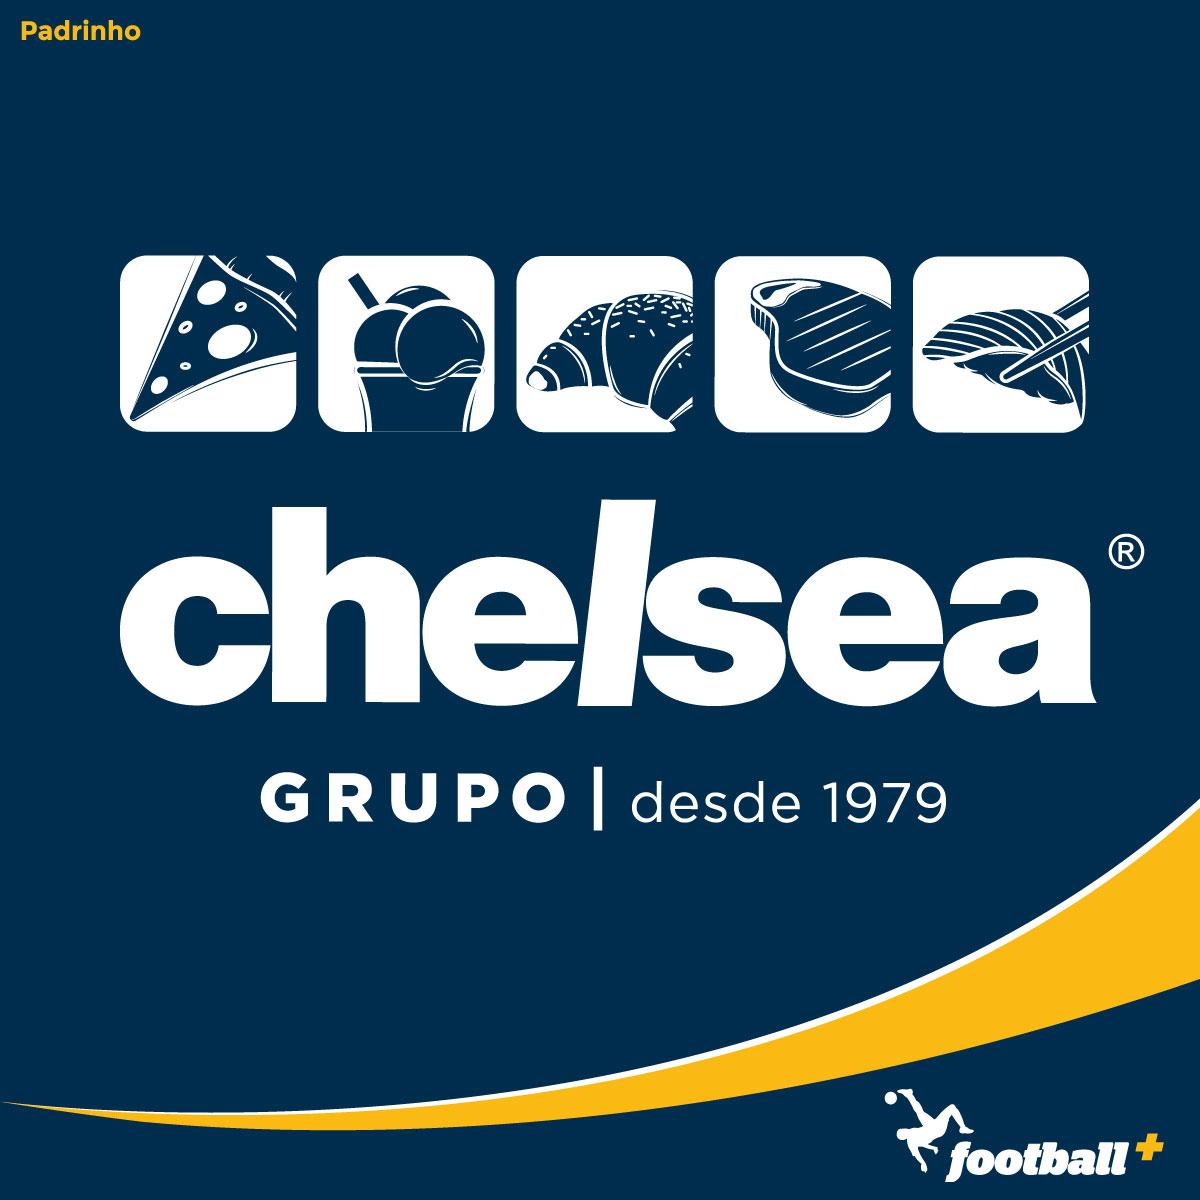 Chelsea Grupo